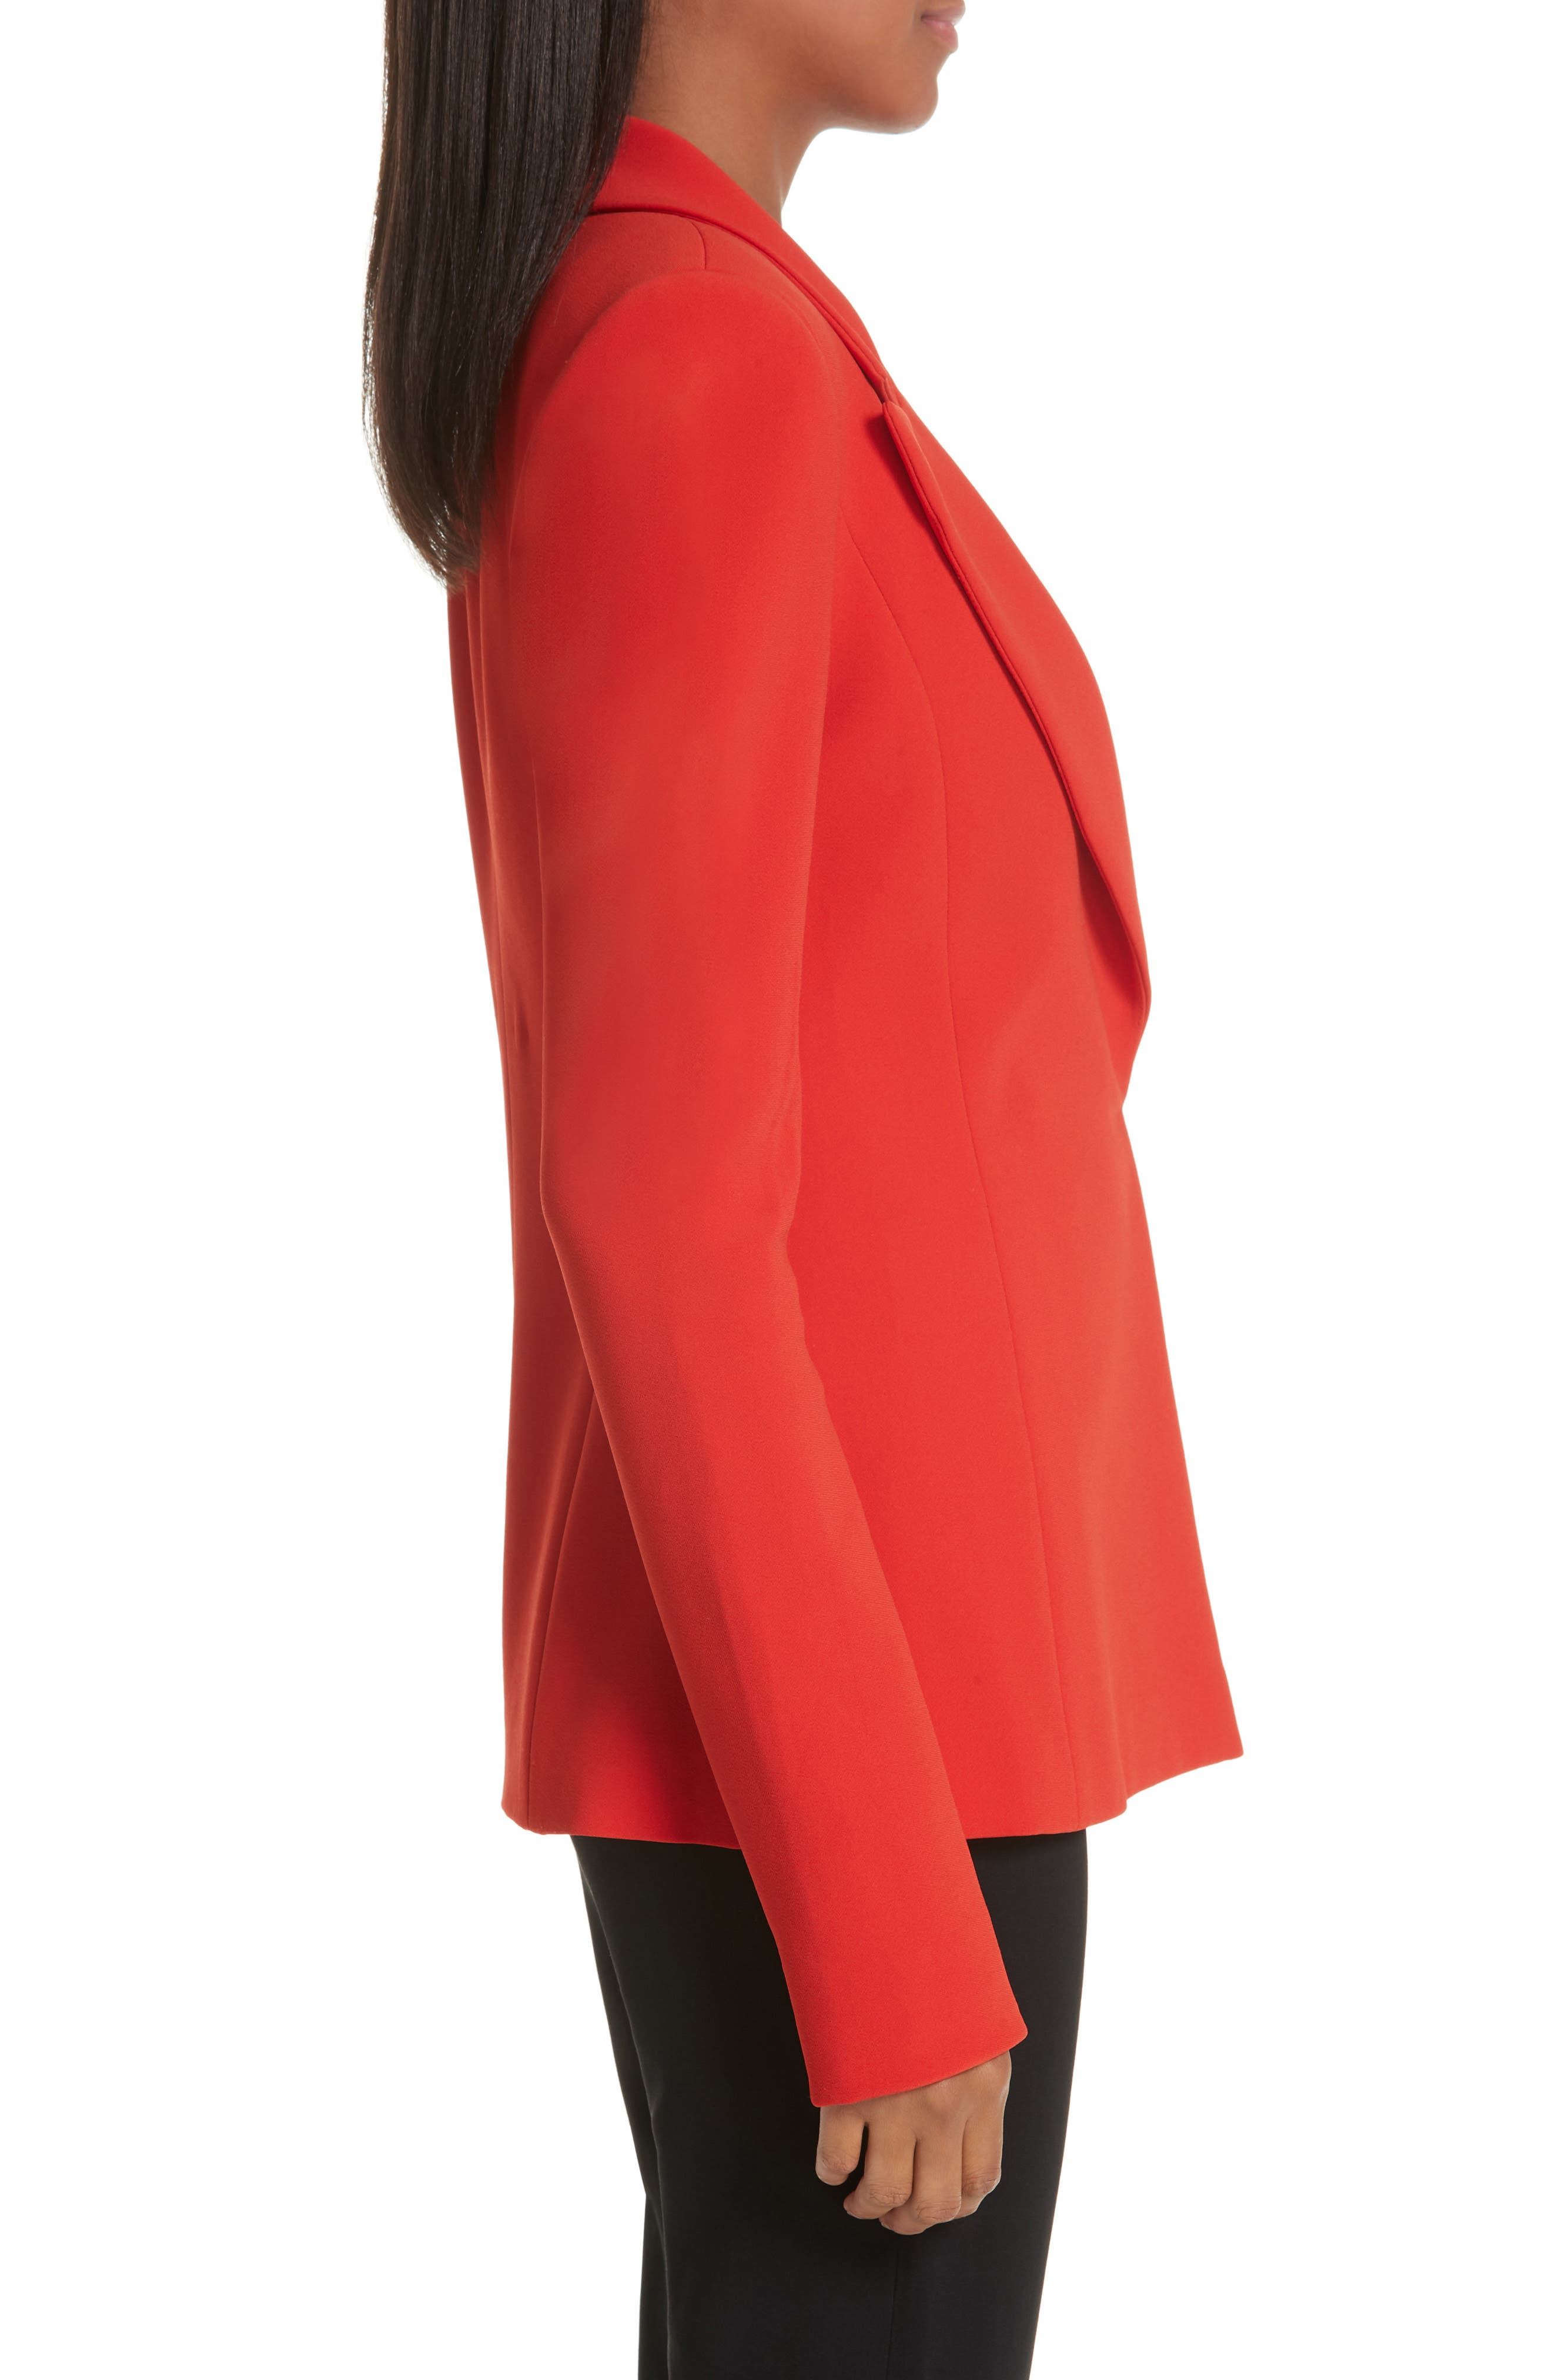 BRANDON MAXWELL, Notch Lapel Jacket, Alternate thumbnail 4, color, FUCHSIA